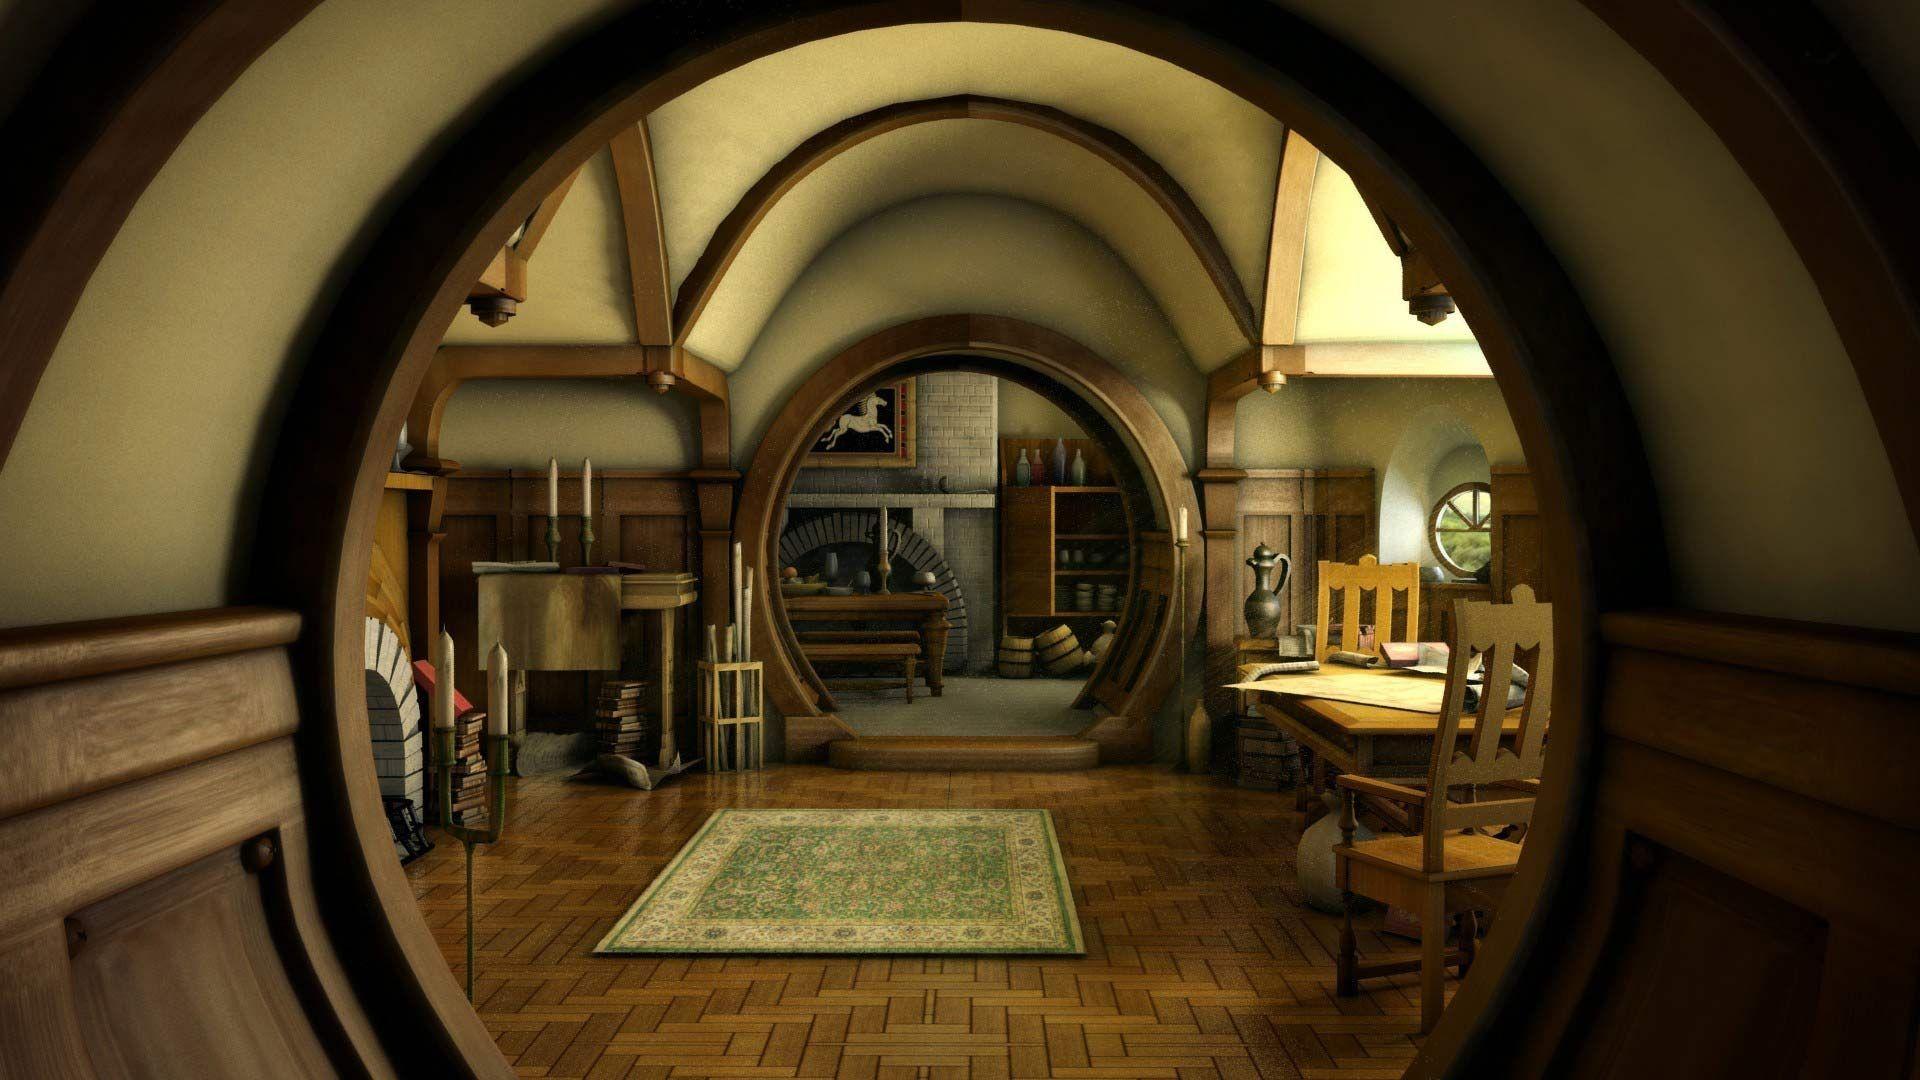 Hobbit Home Part - 37: Hobbit House The Hobbit Movie Wallpaper